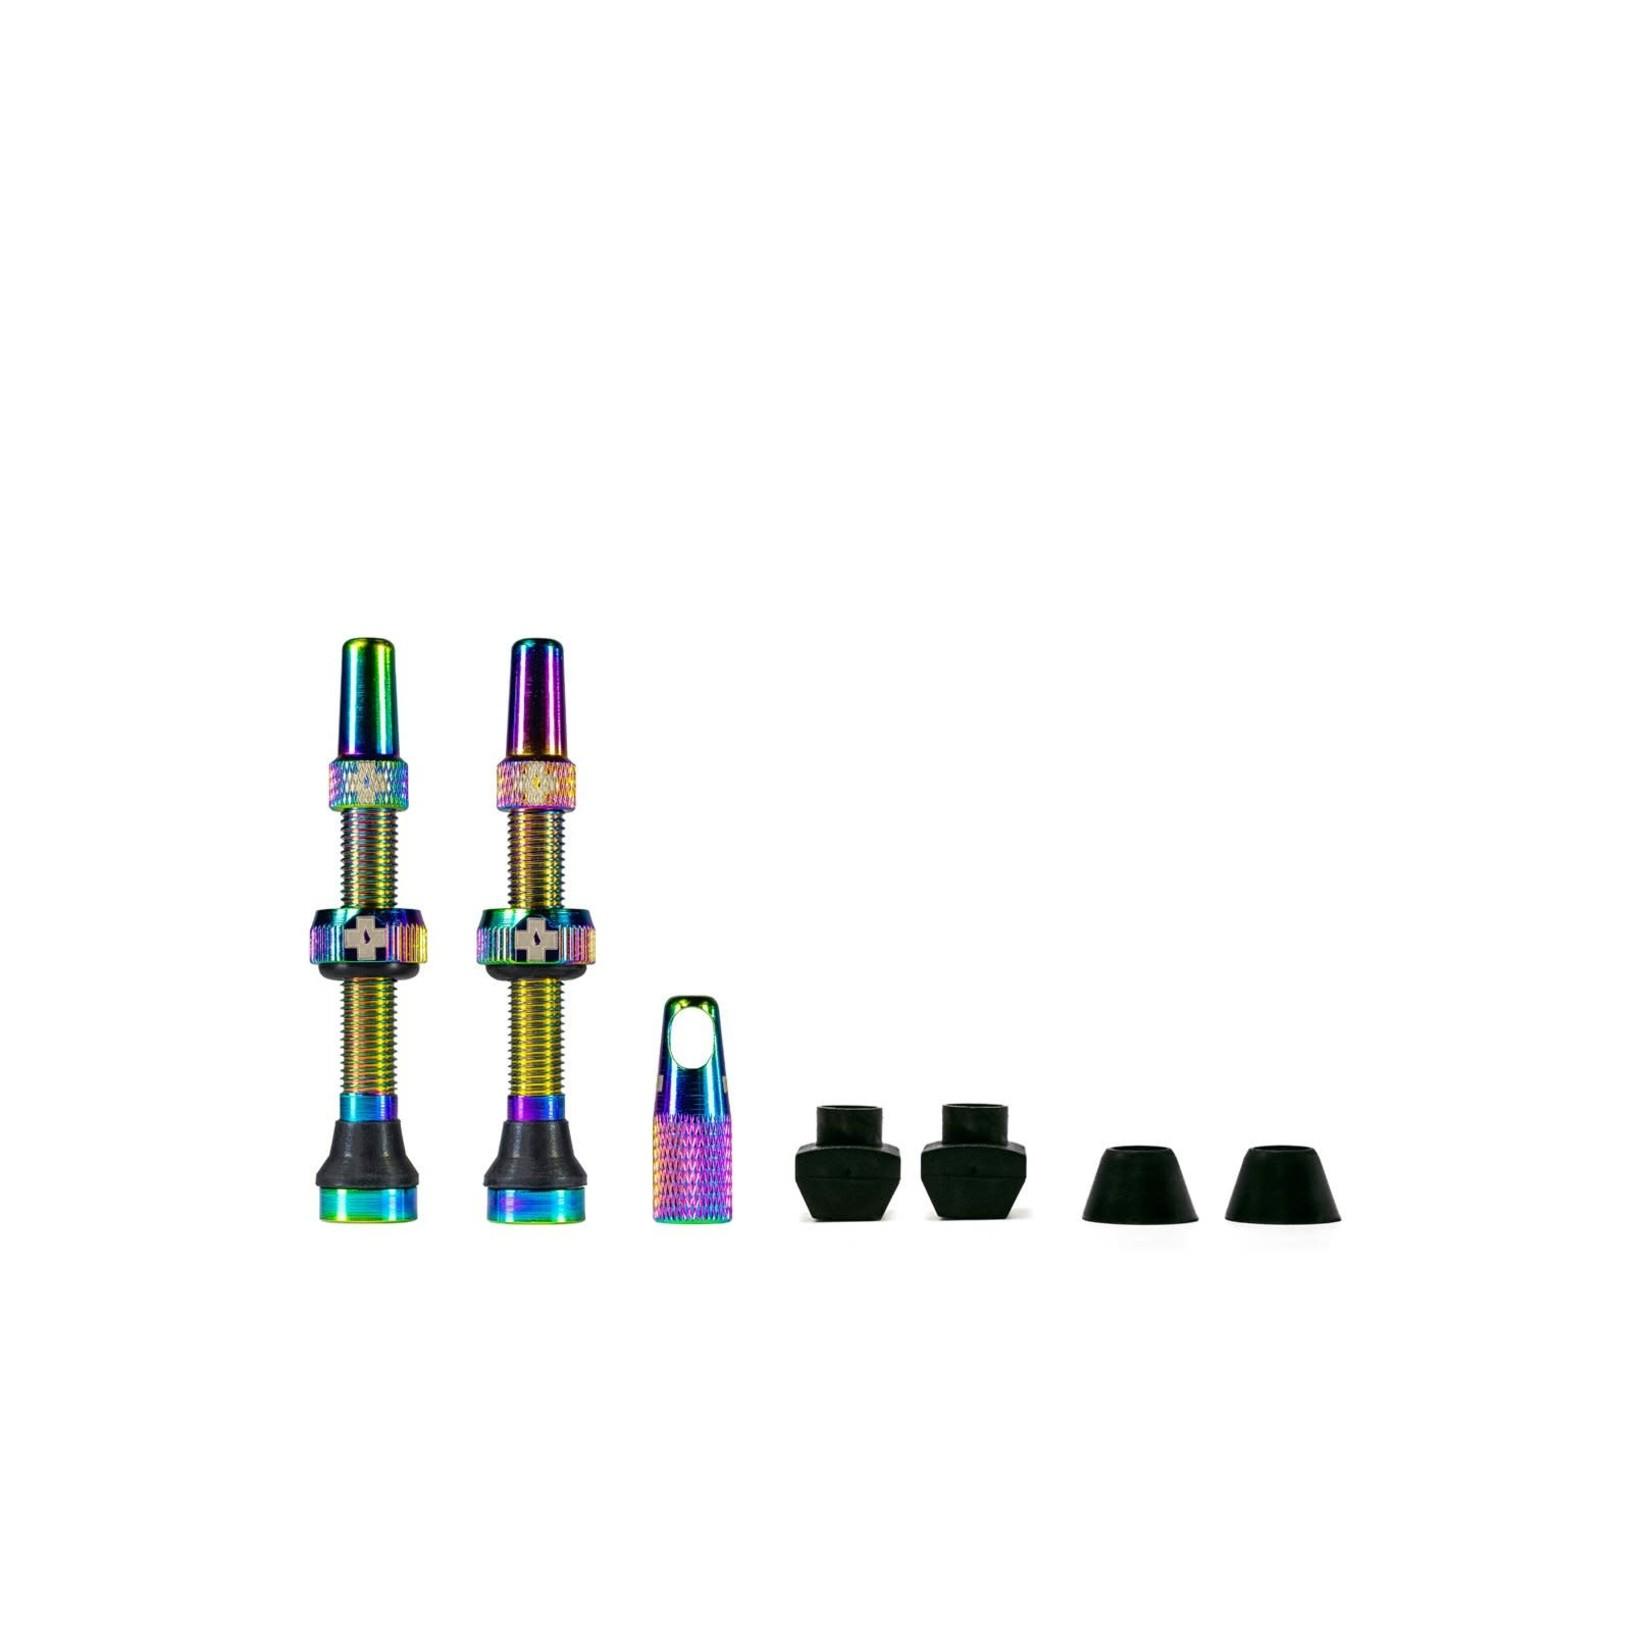 Muc-Off Muc-Off kit valvola tubeless 44mm - arcoiris